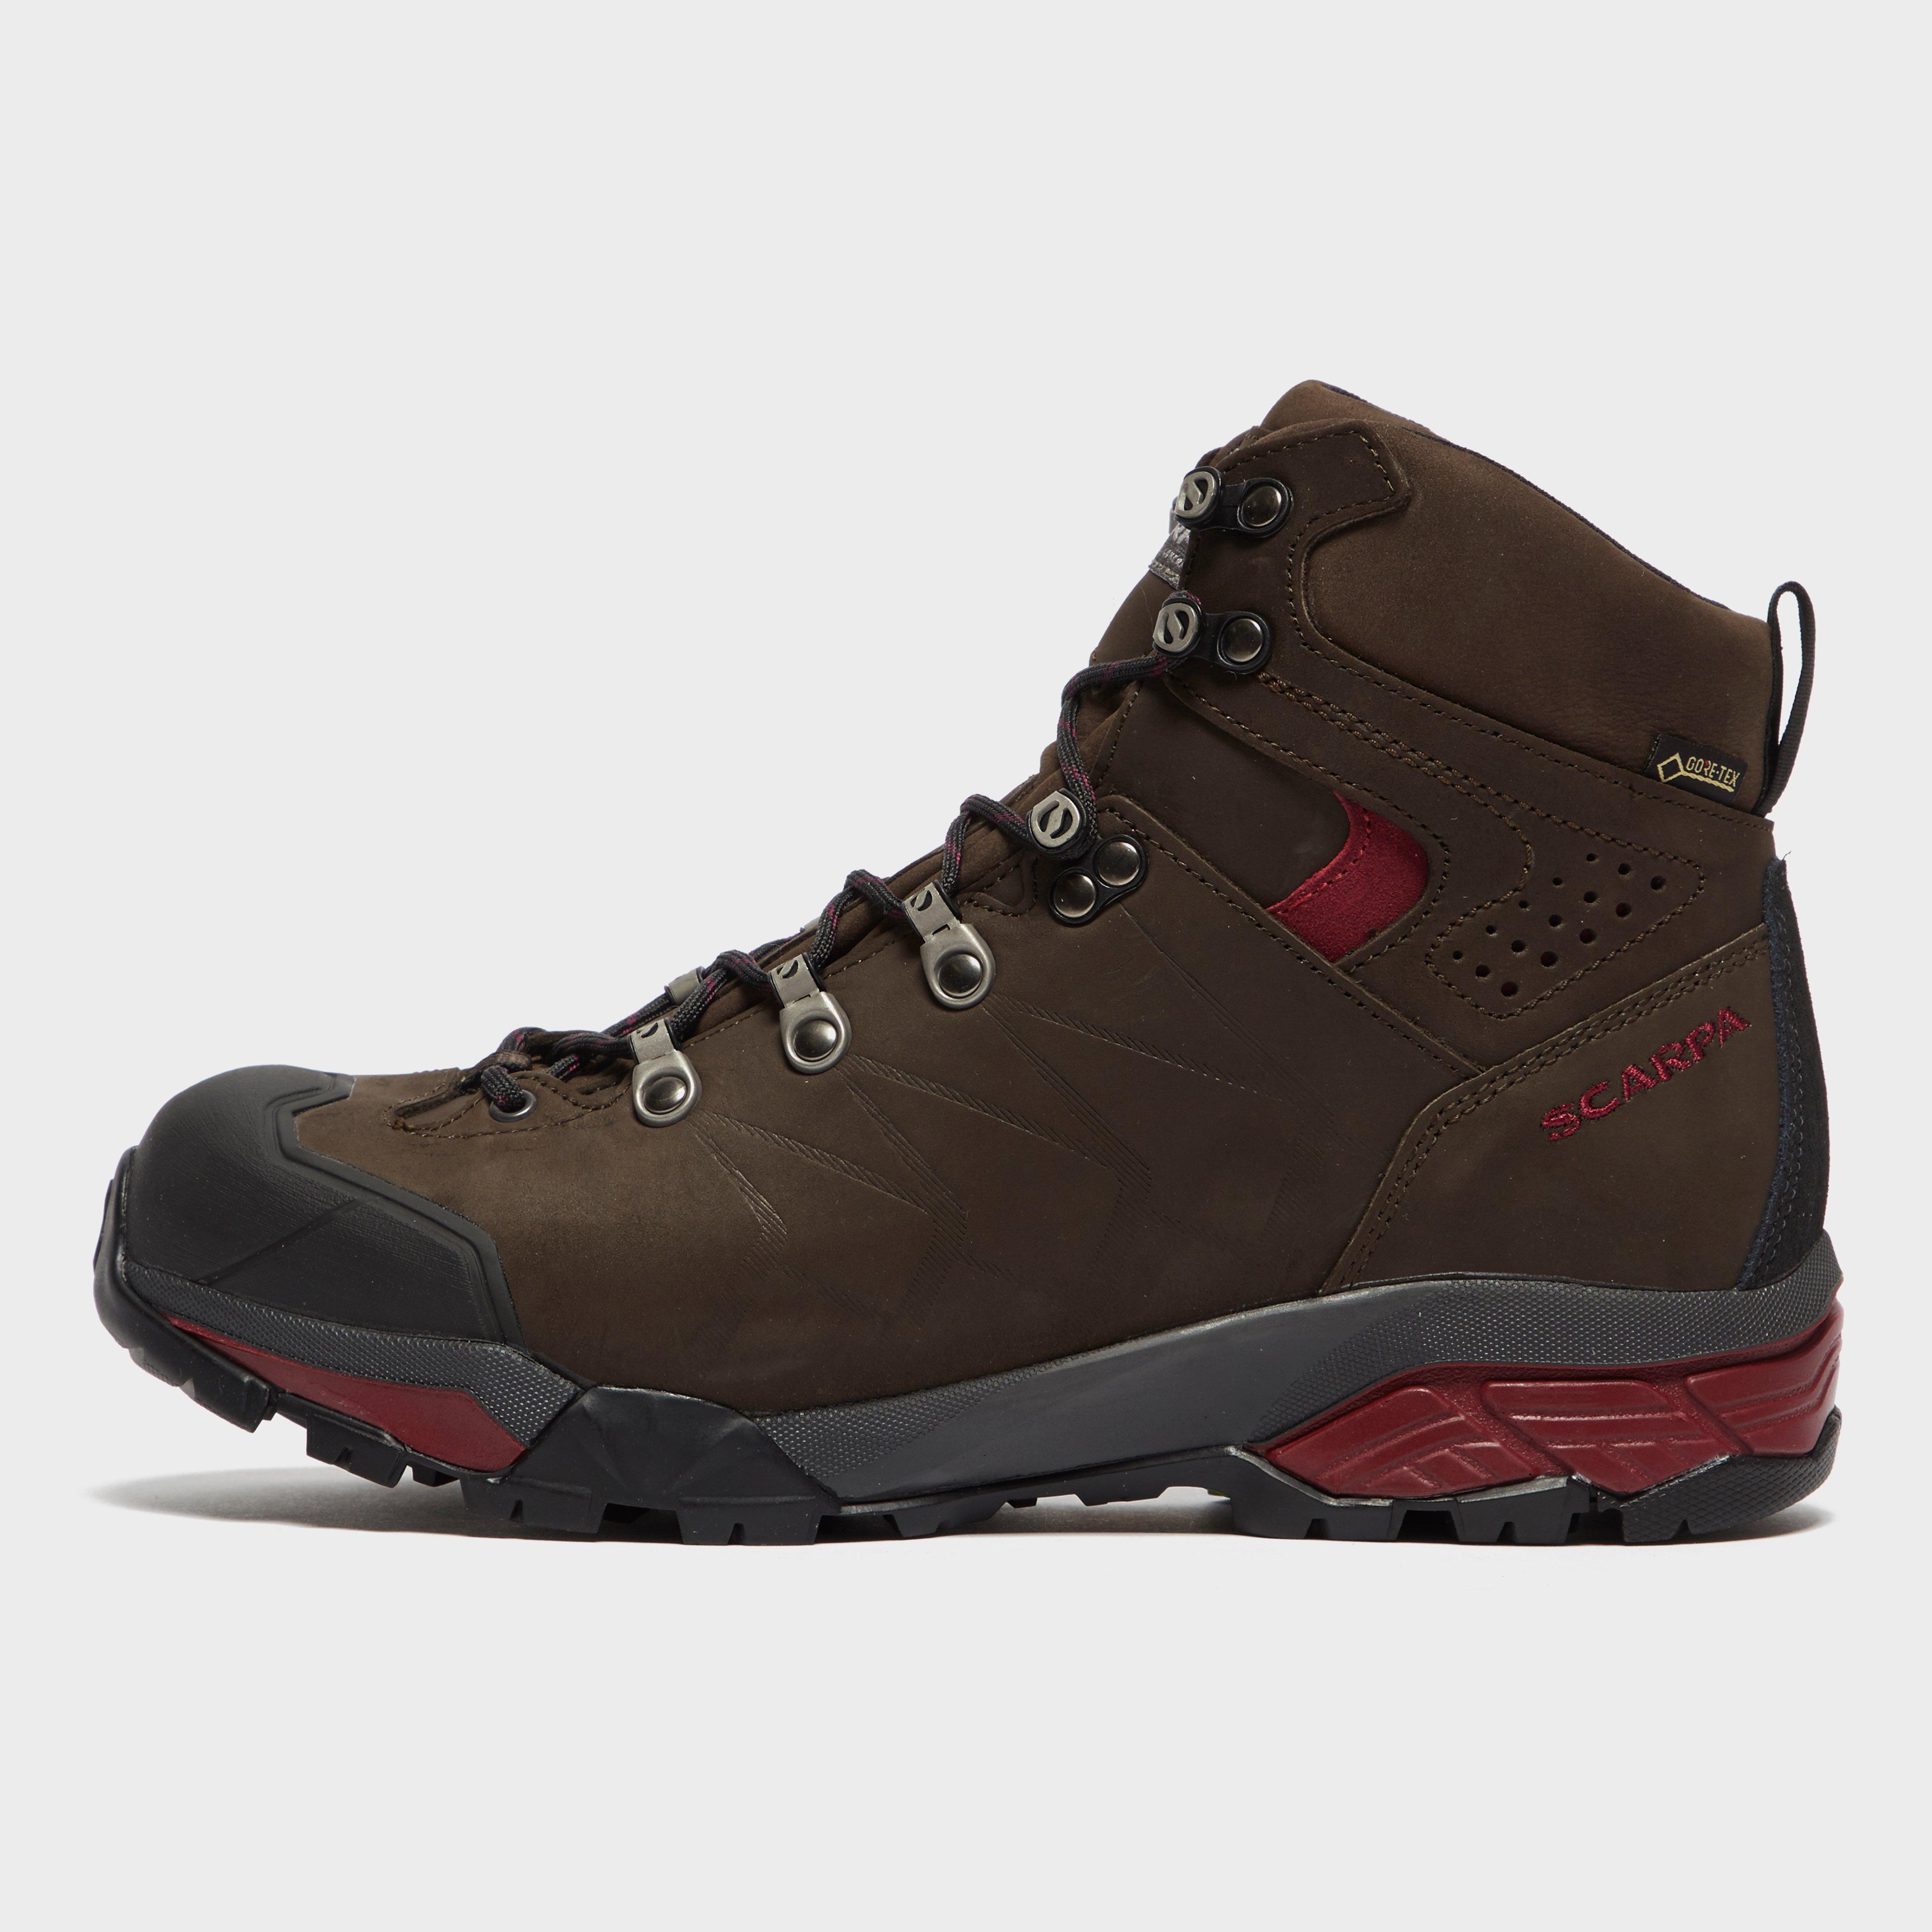 Scarpa Scarpa womens ZG Pro GORE-TEX Walking Boots - Brown, Brown